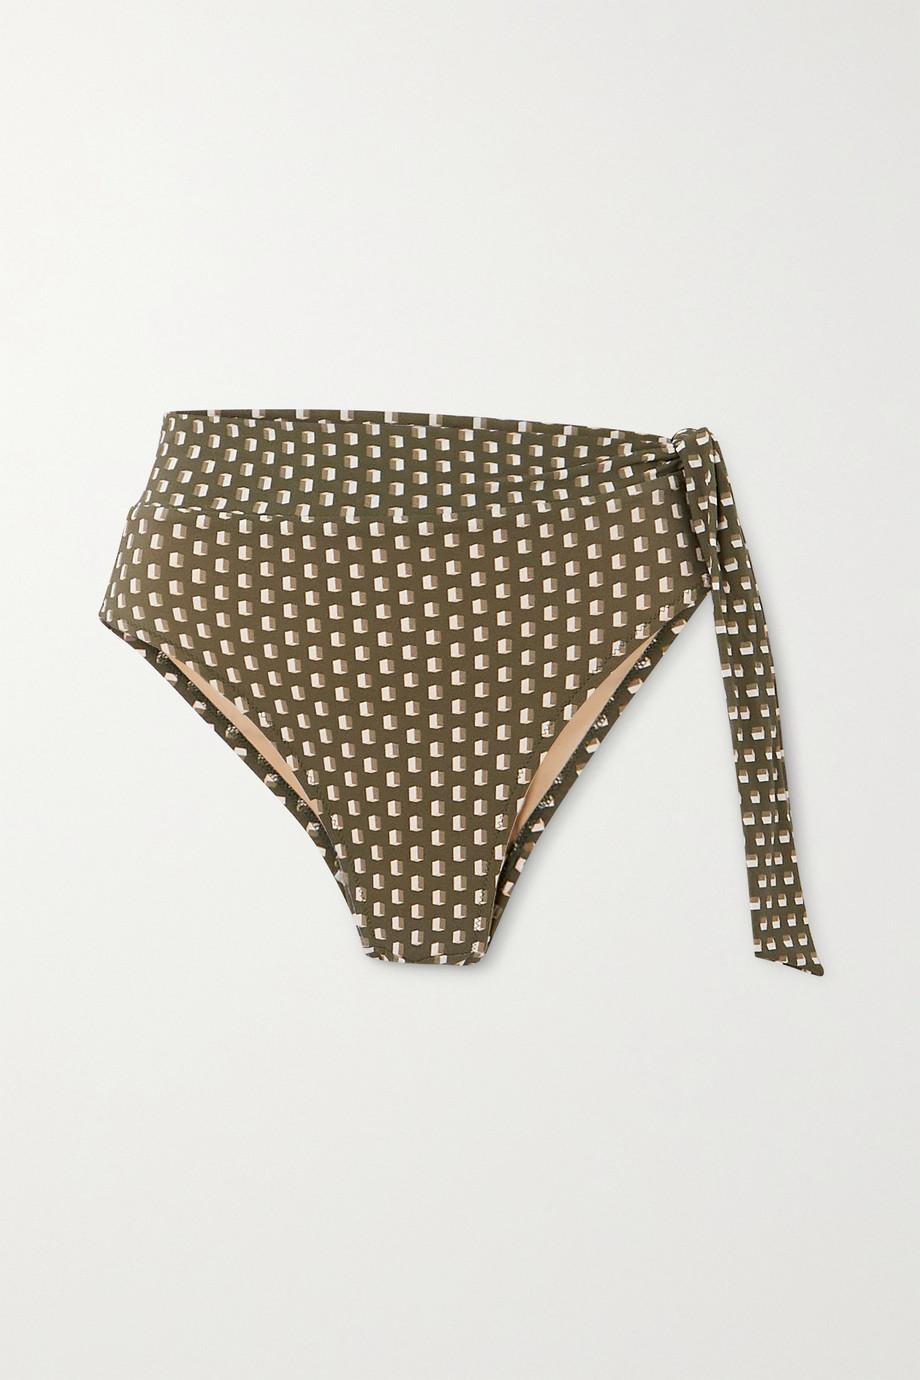 Evarae Yasmeen knotted printed bikini briefs